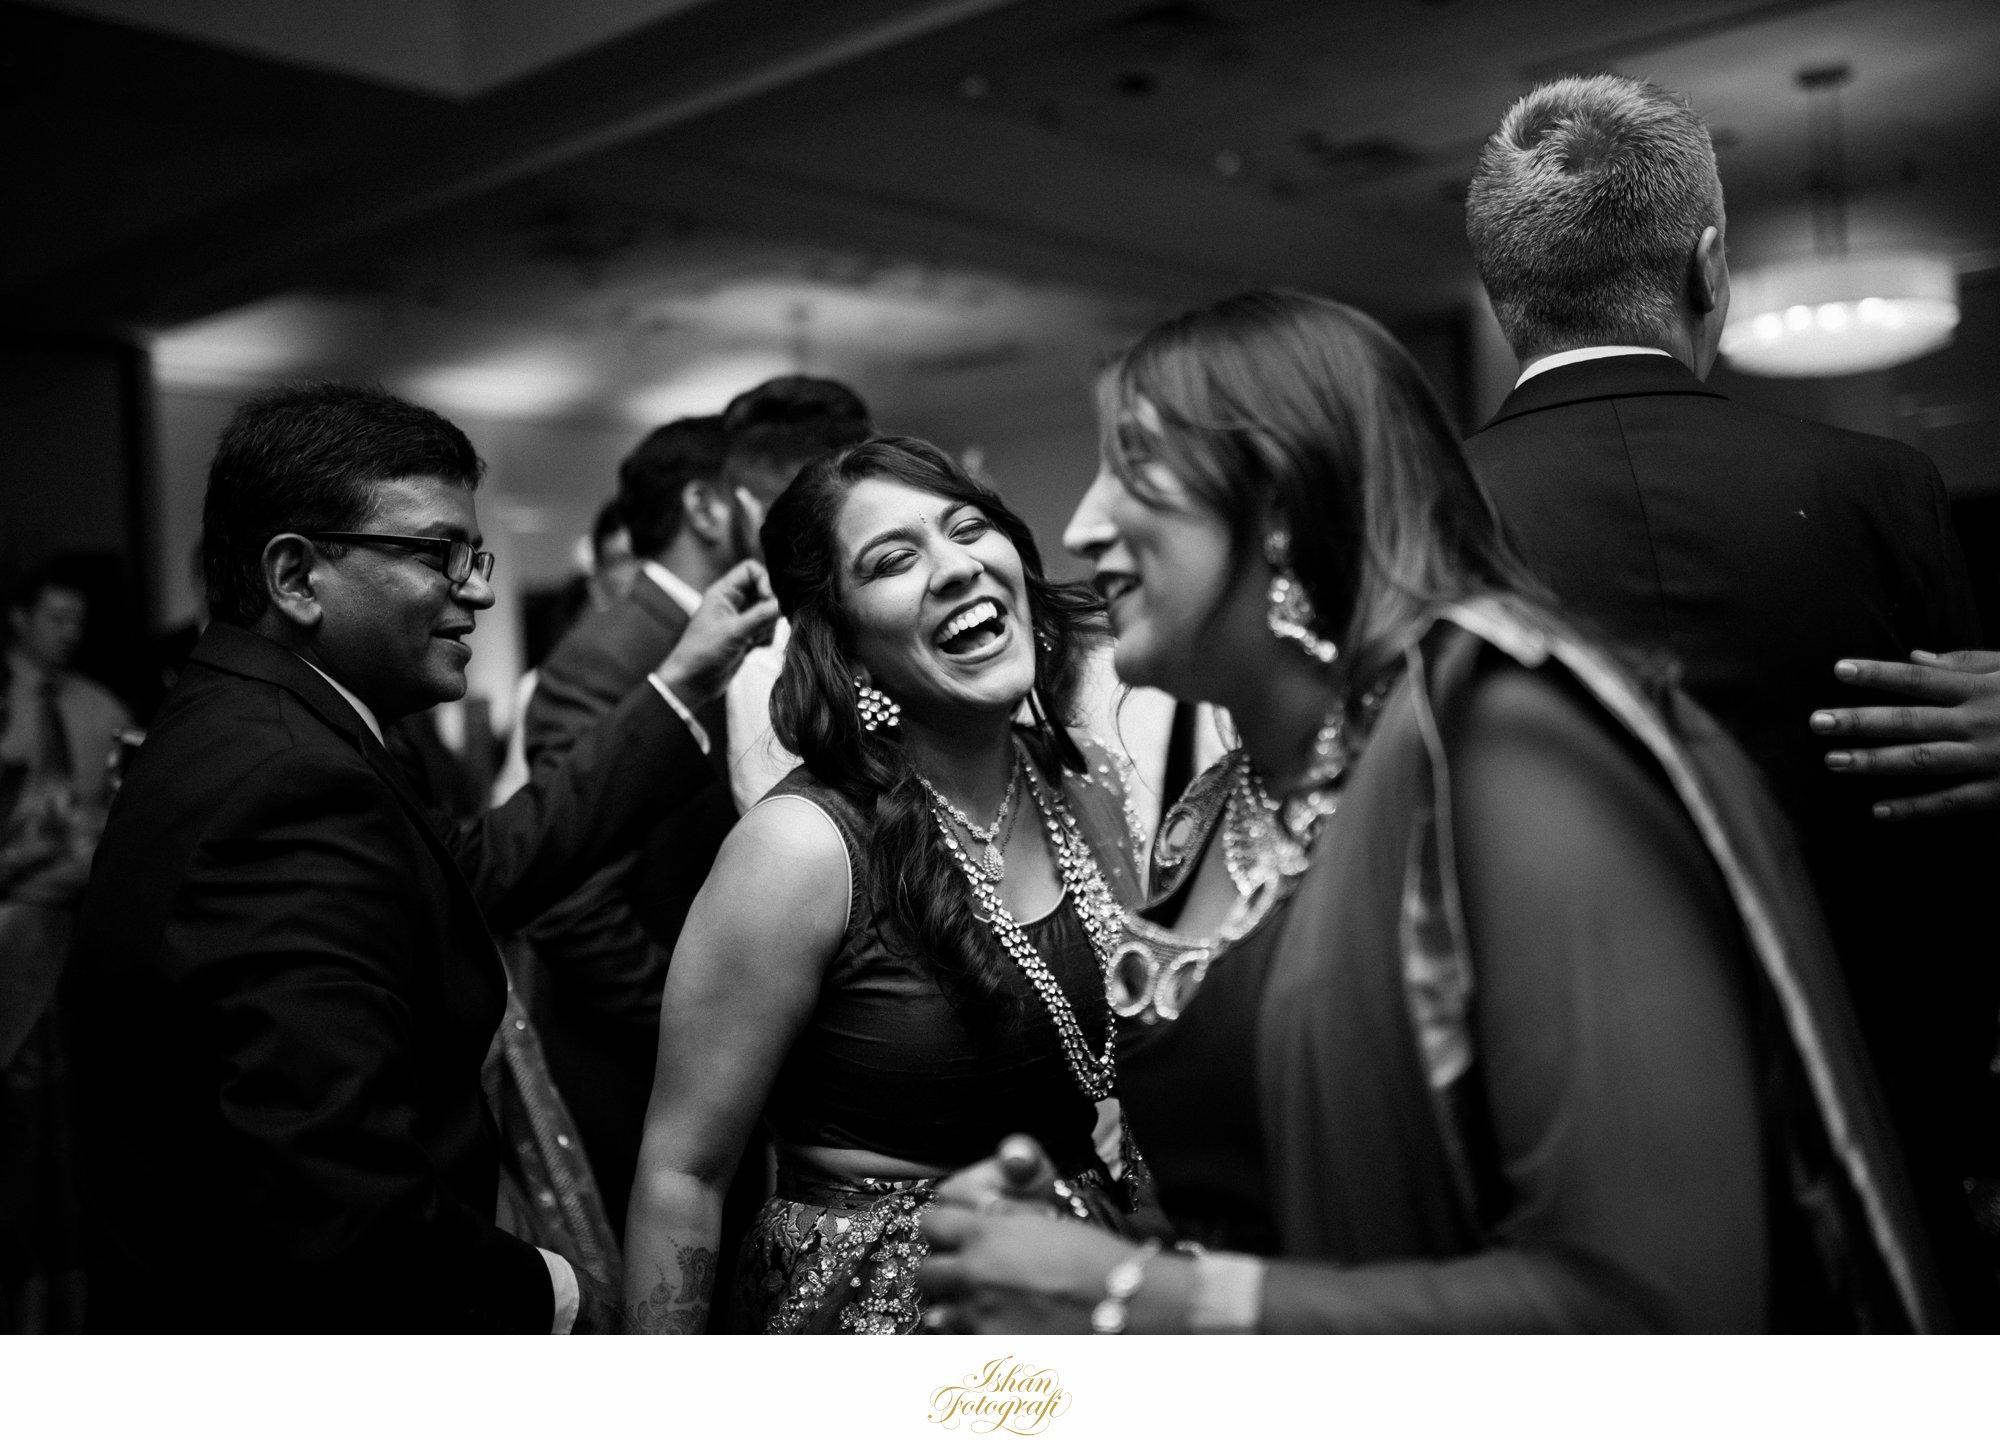 wedding-reception-photo-sheraton-harrisburg-hershey